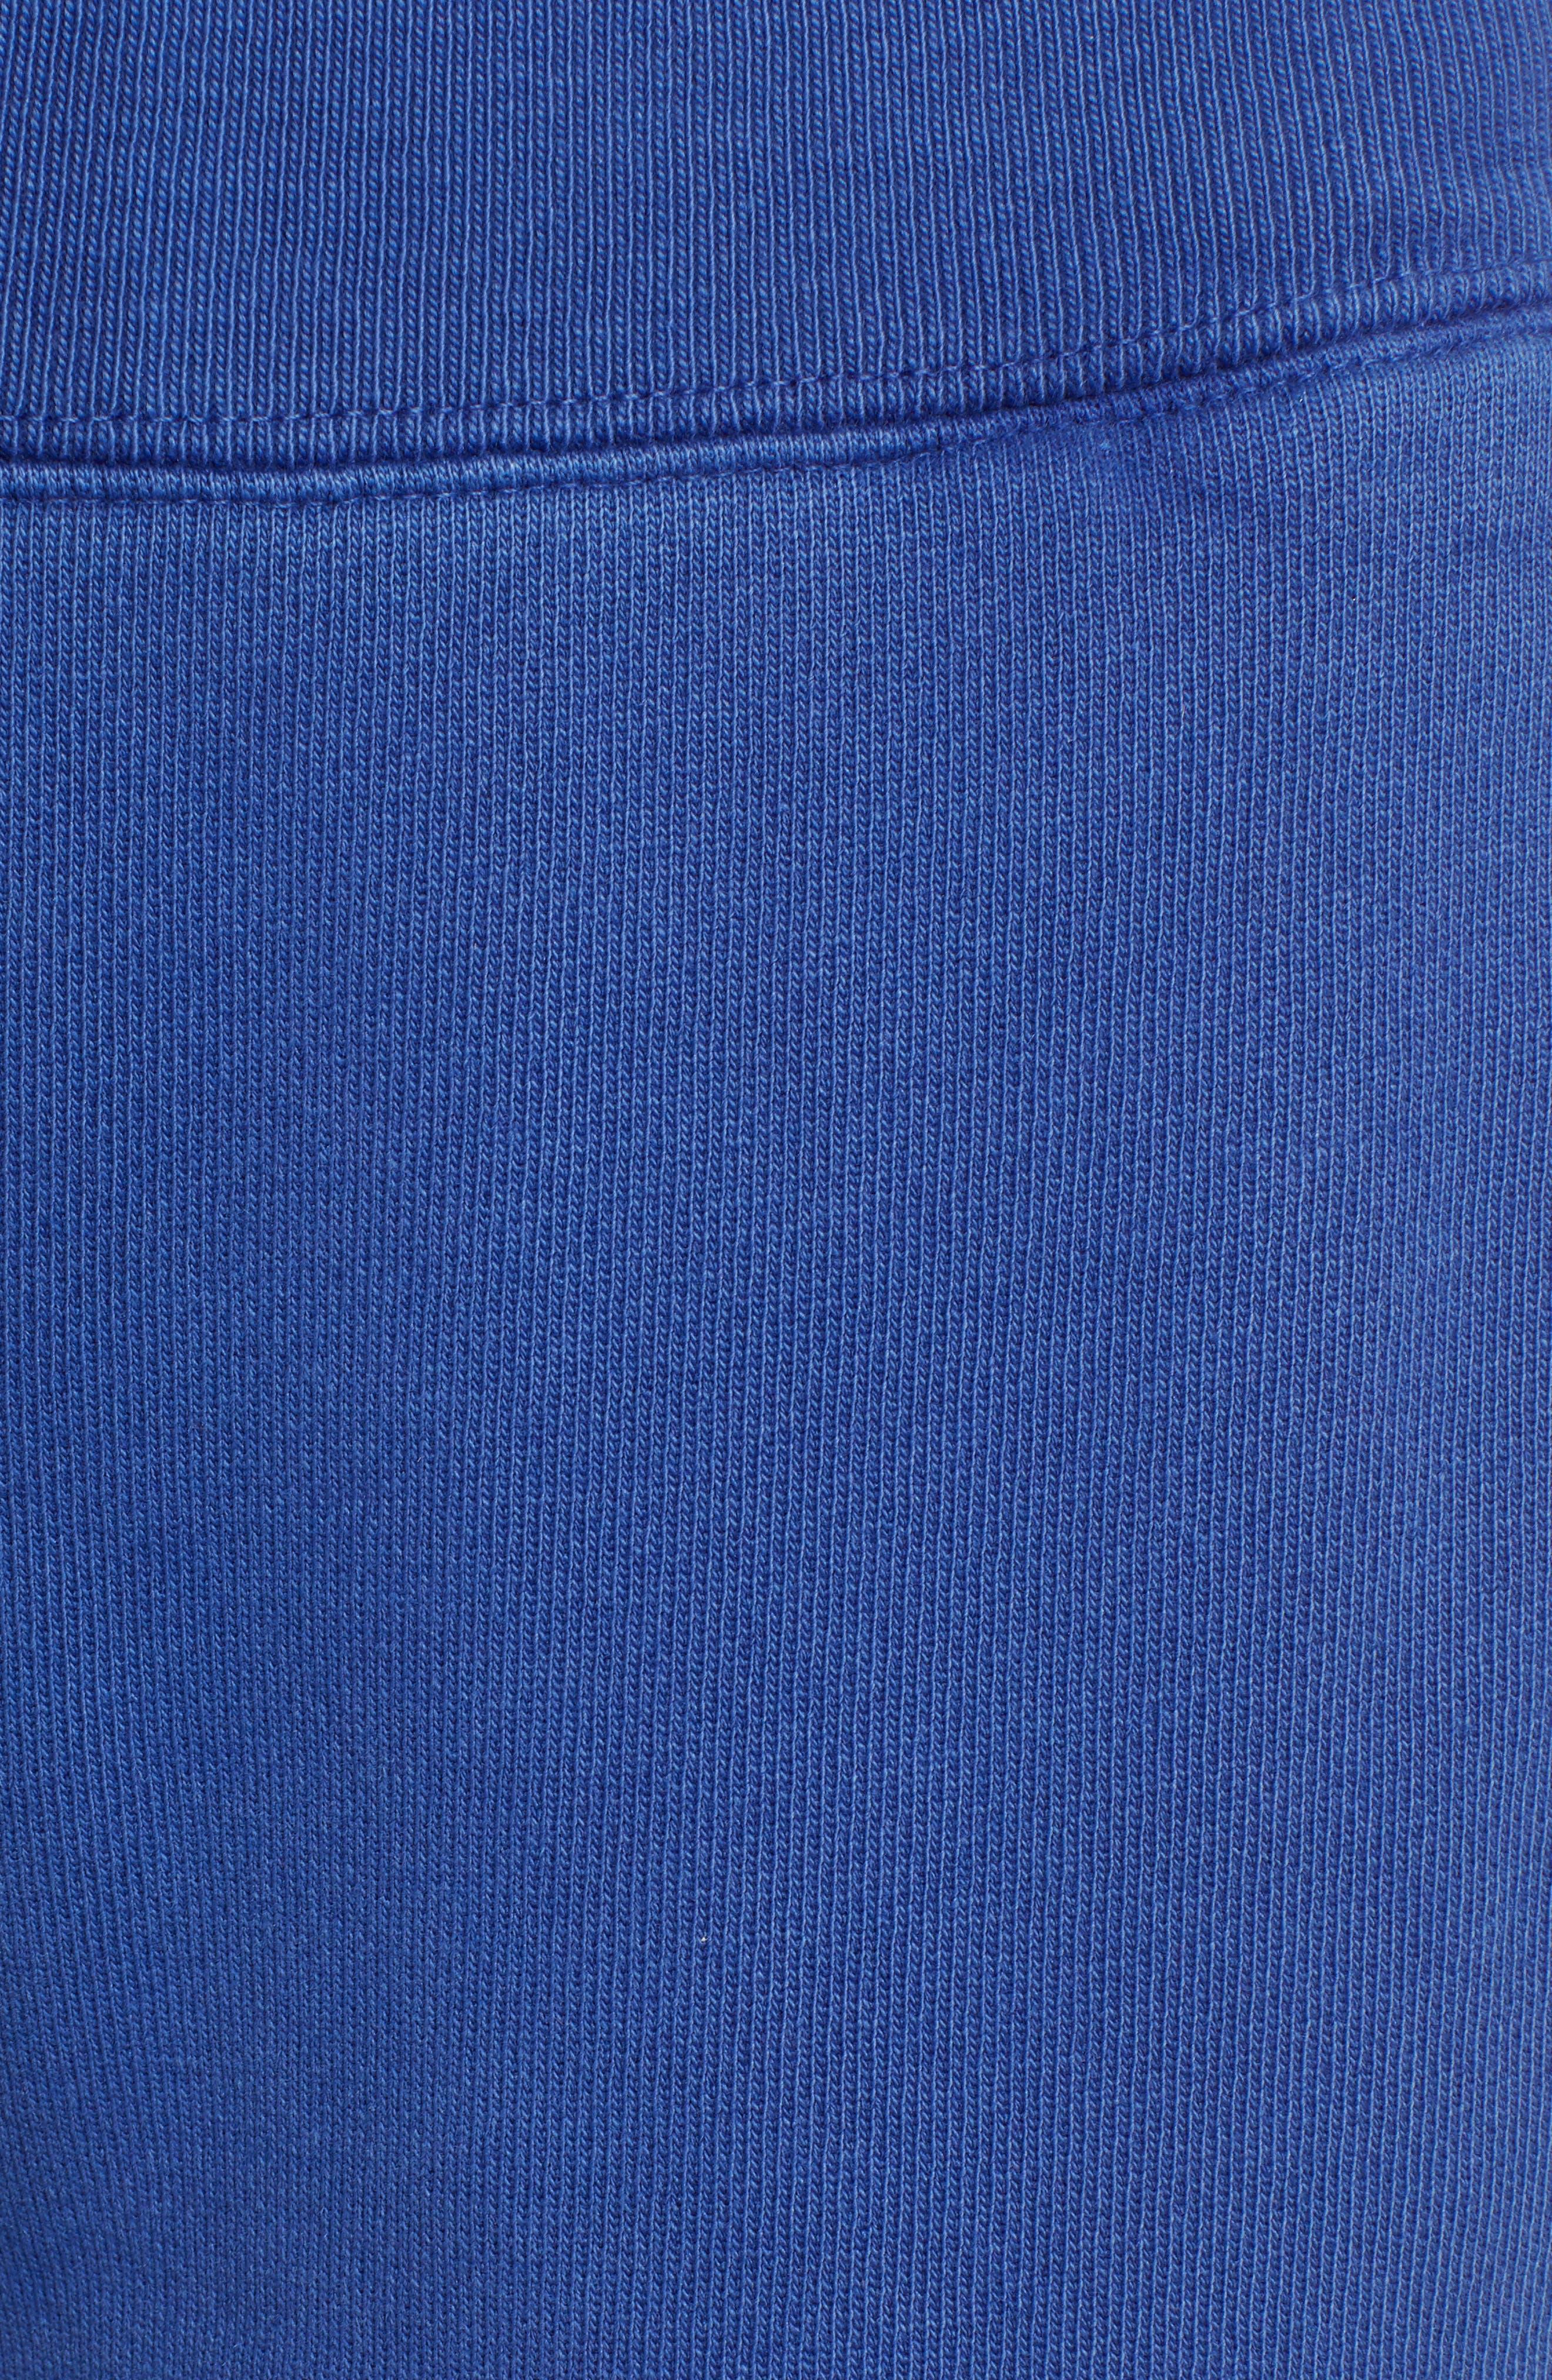 Garment Dyed Jogger Pants,                             Alternate thumbnail 6, color,                             SURF THE WEB